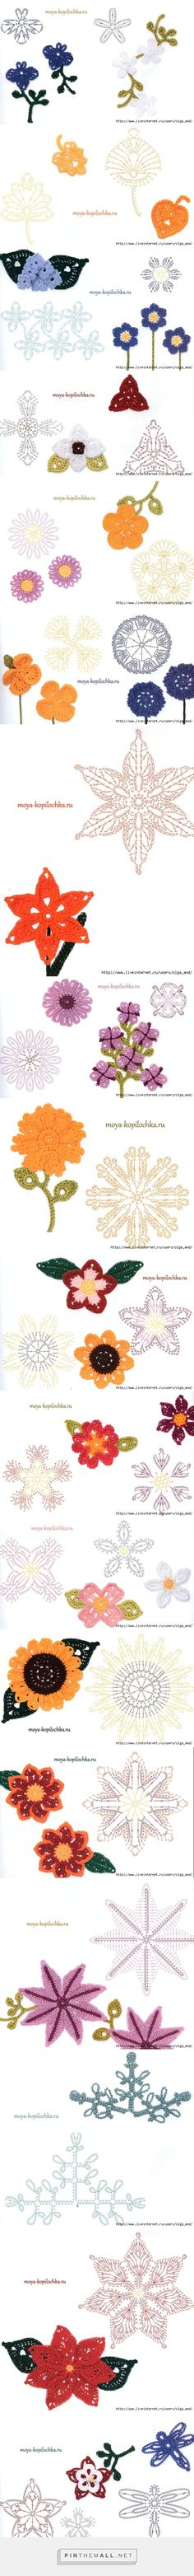 fiori e foglie - created via http://pinthemall.net